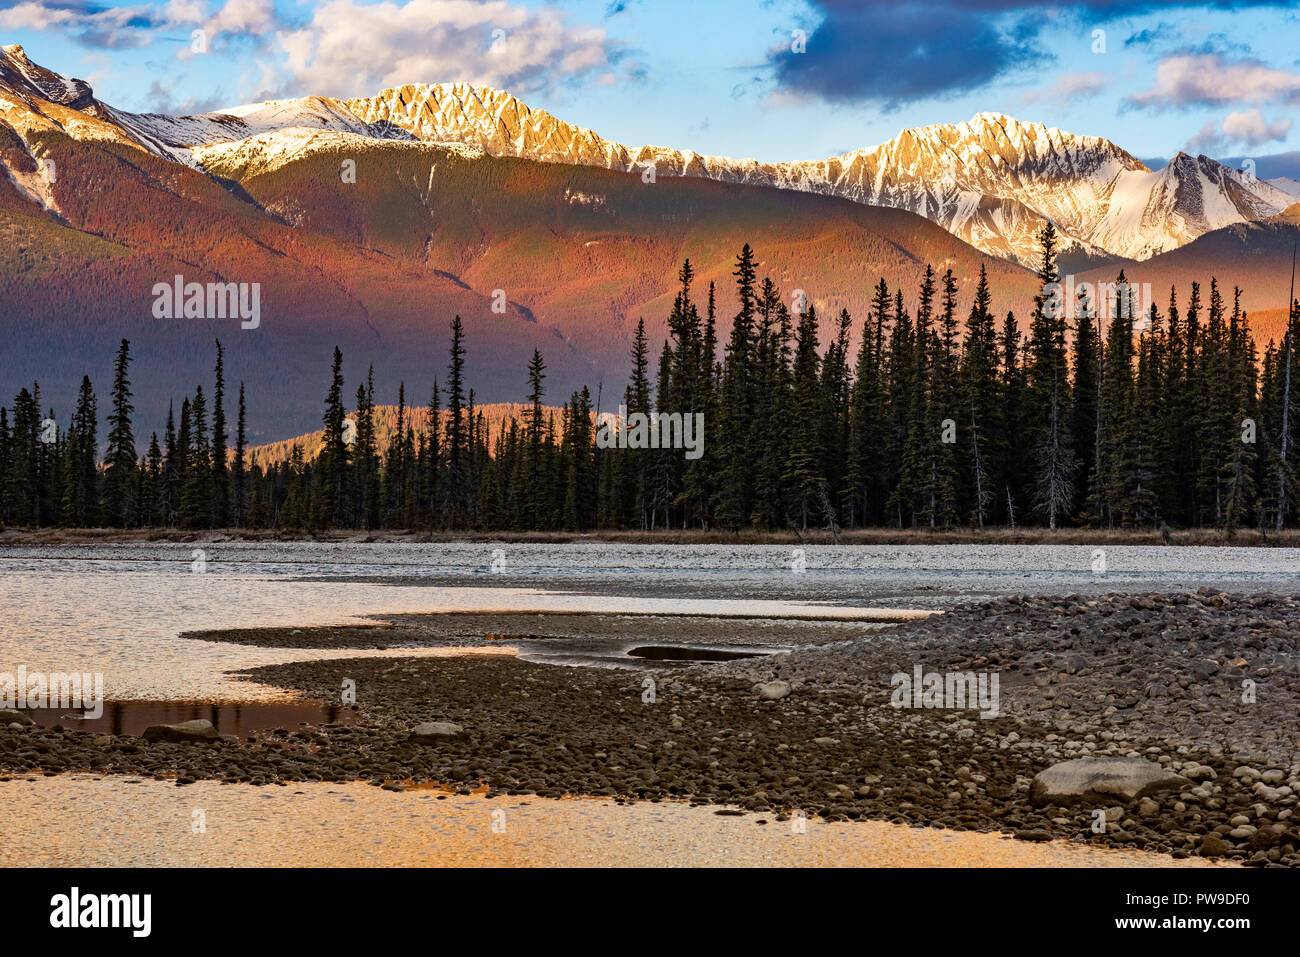 Athabasca River Valley, Jasper National Park, Alberta, Canada - Stock Image